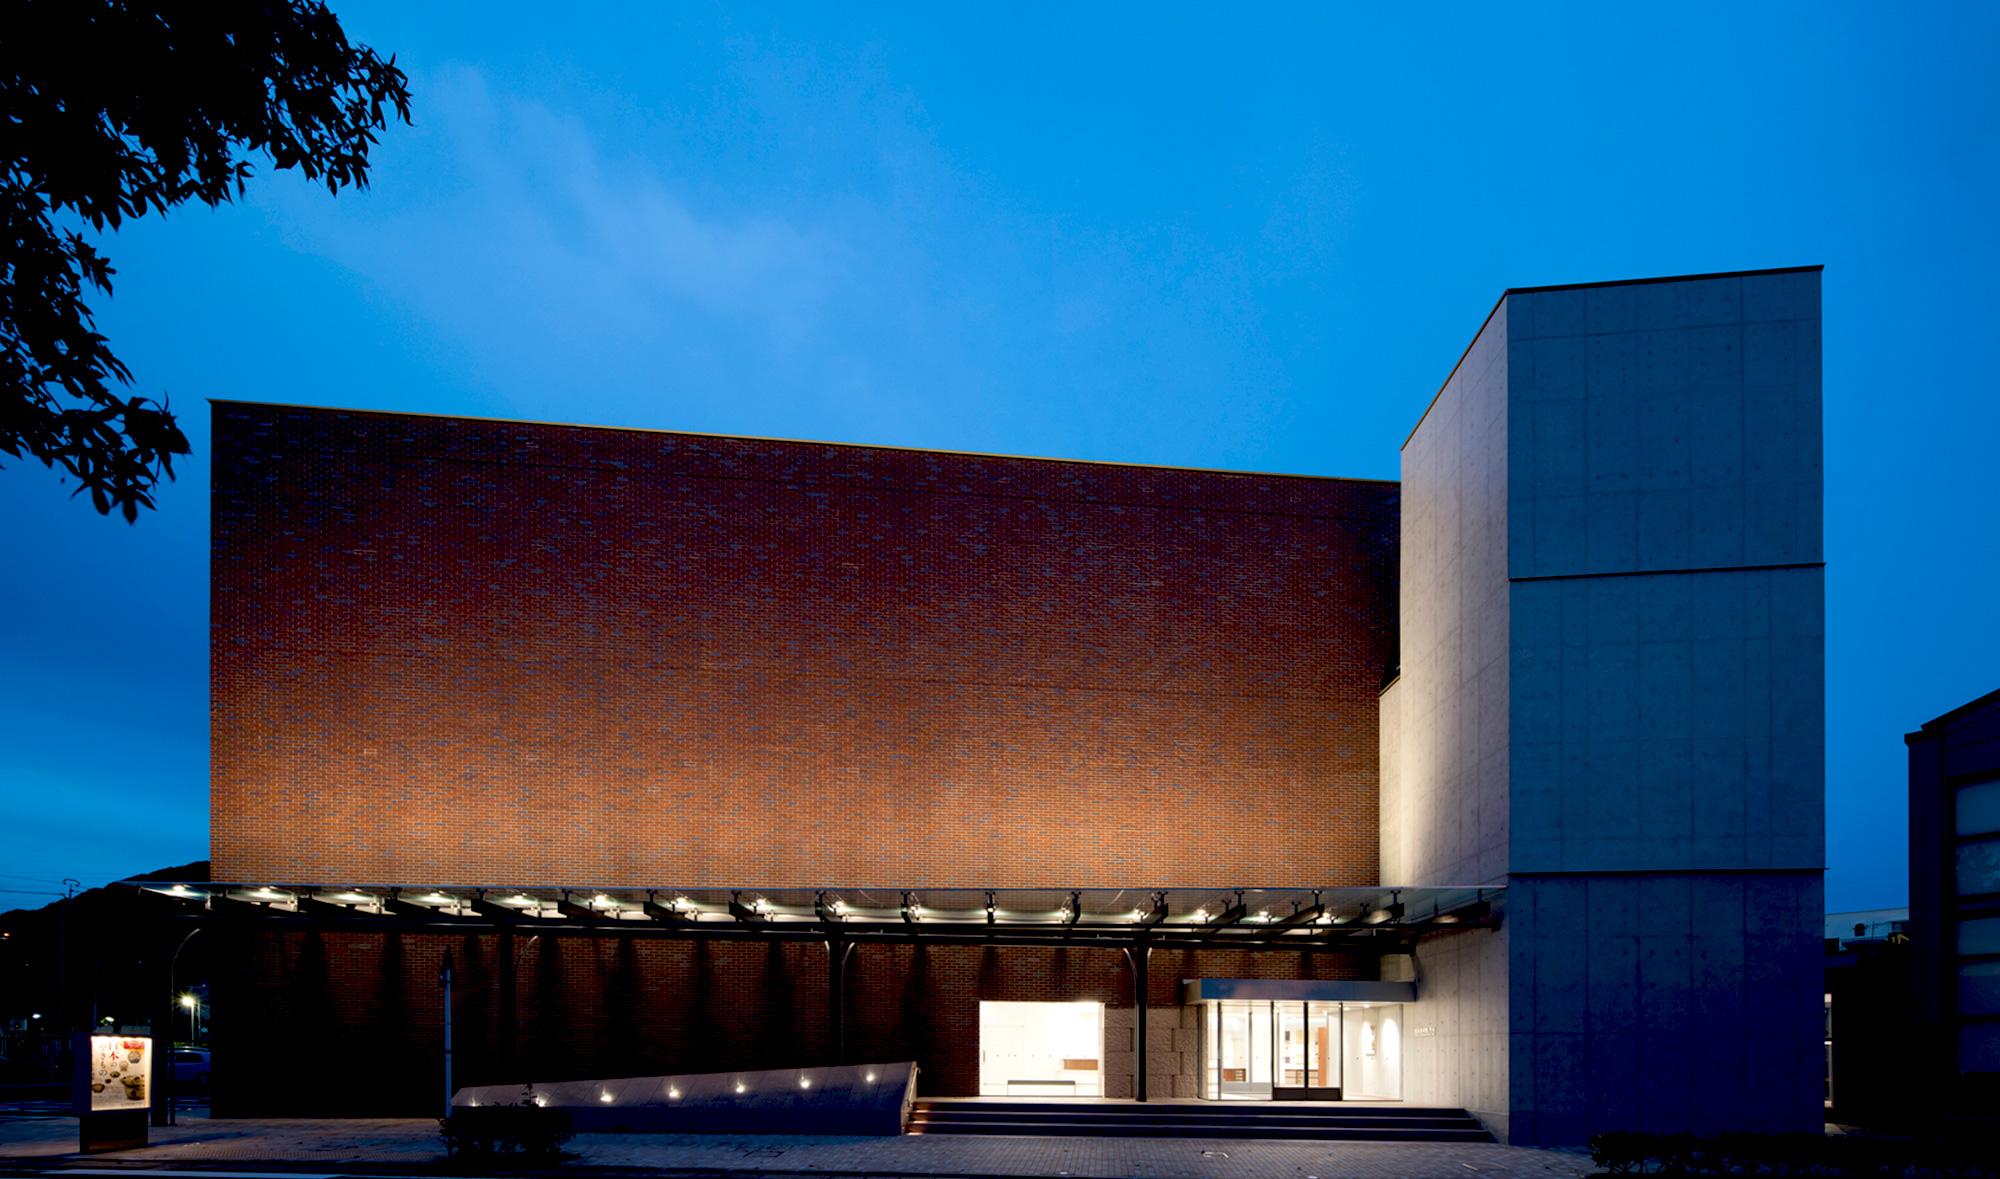 Idemitsu Museum of Arts, Moji  (Fukuoka)